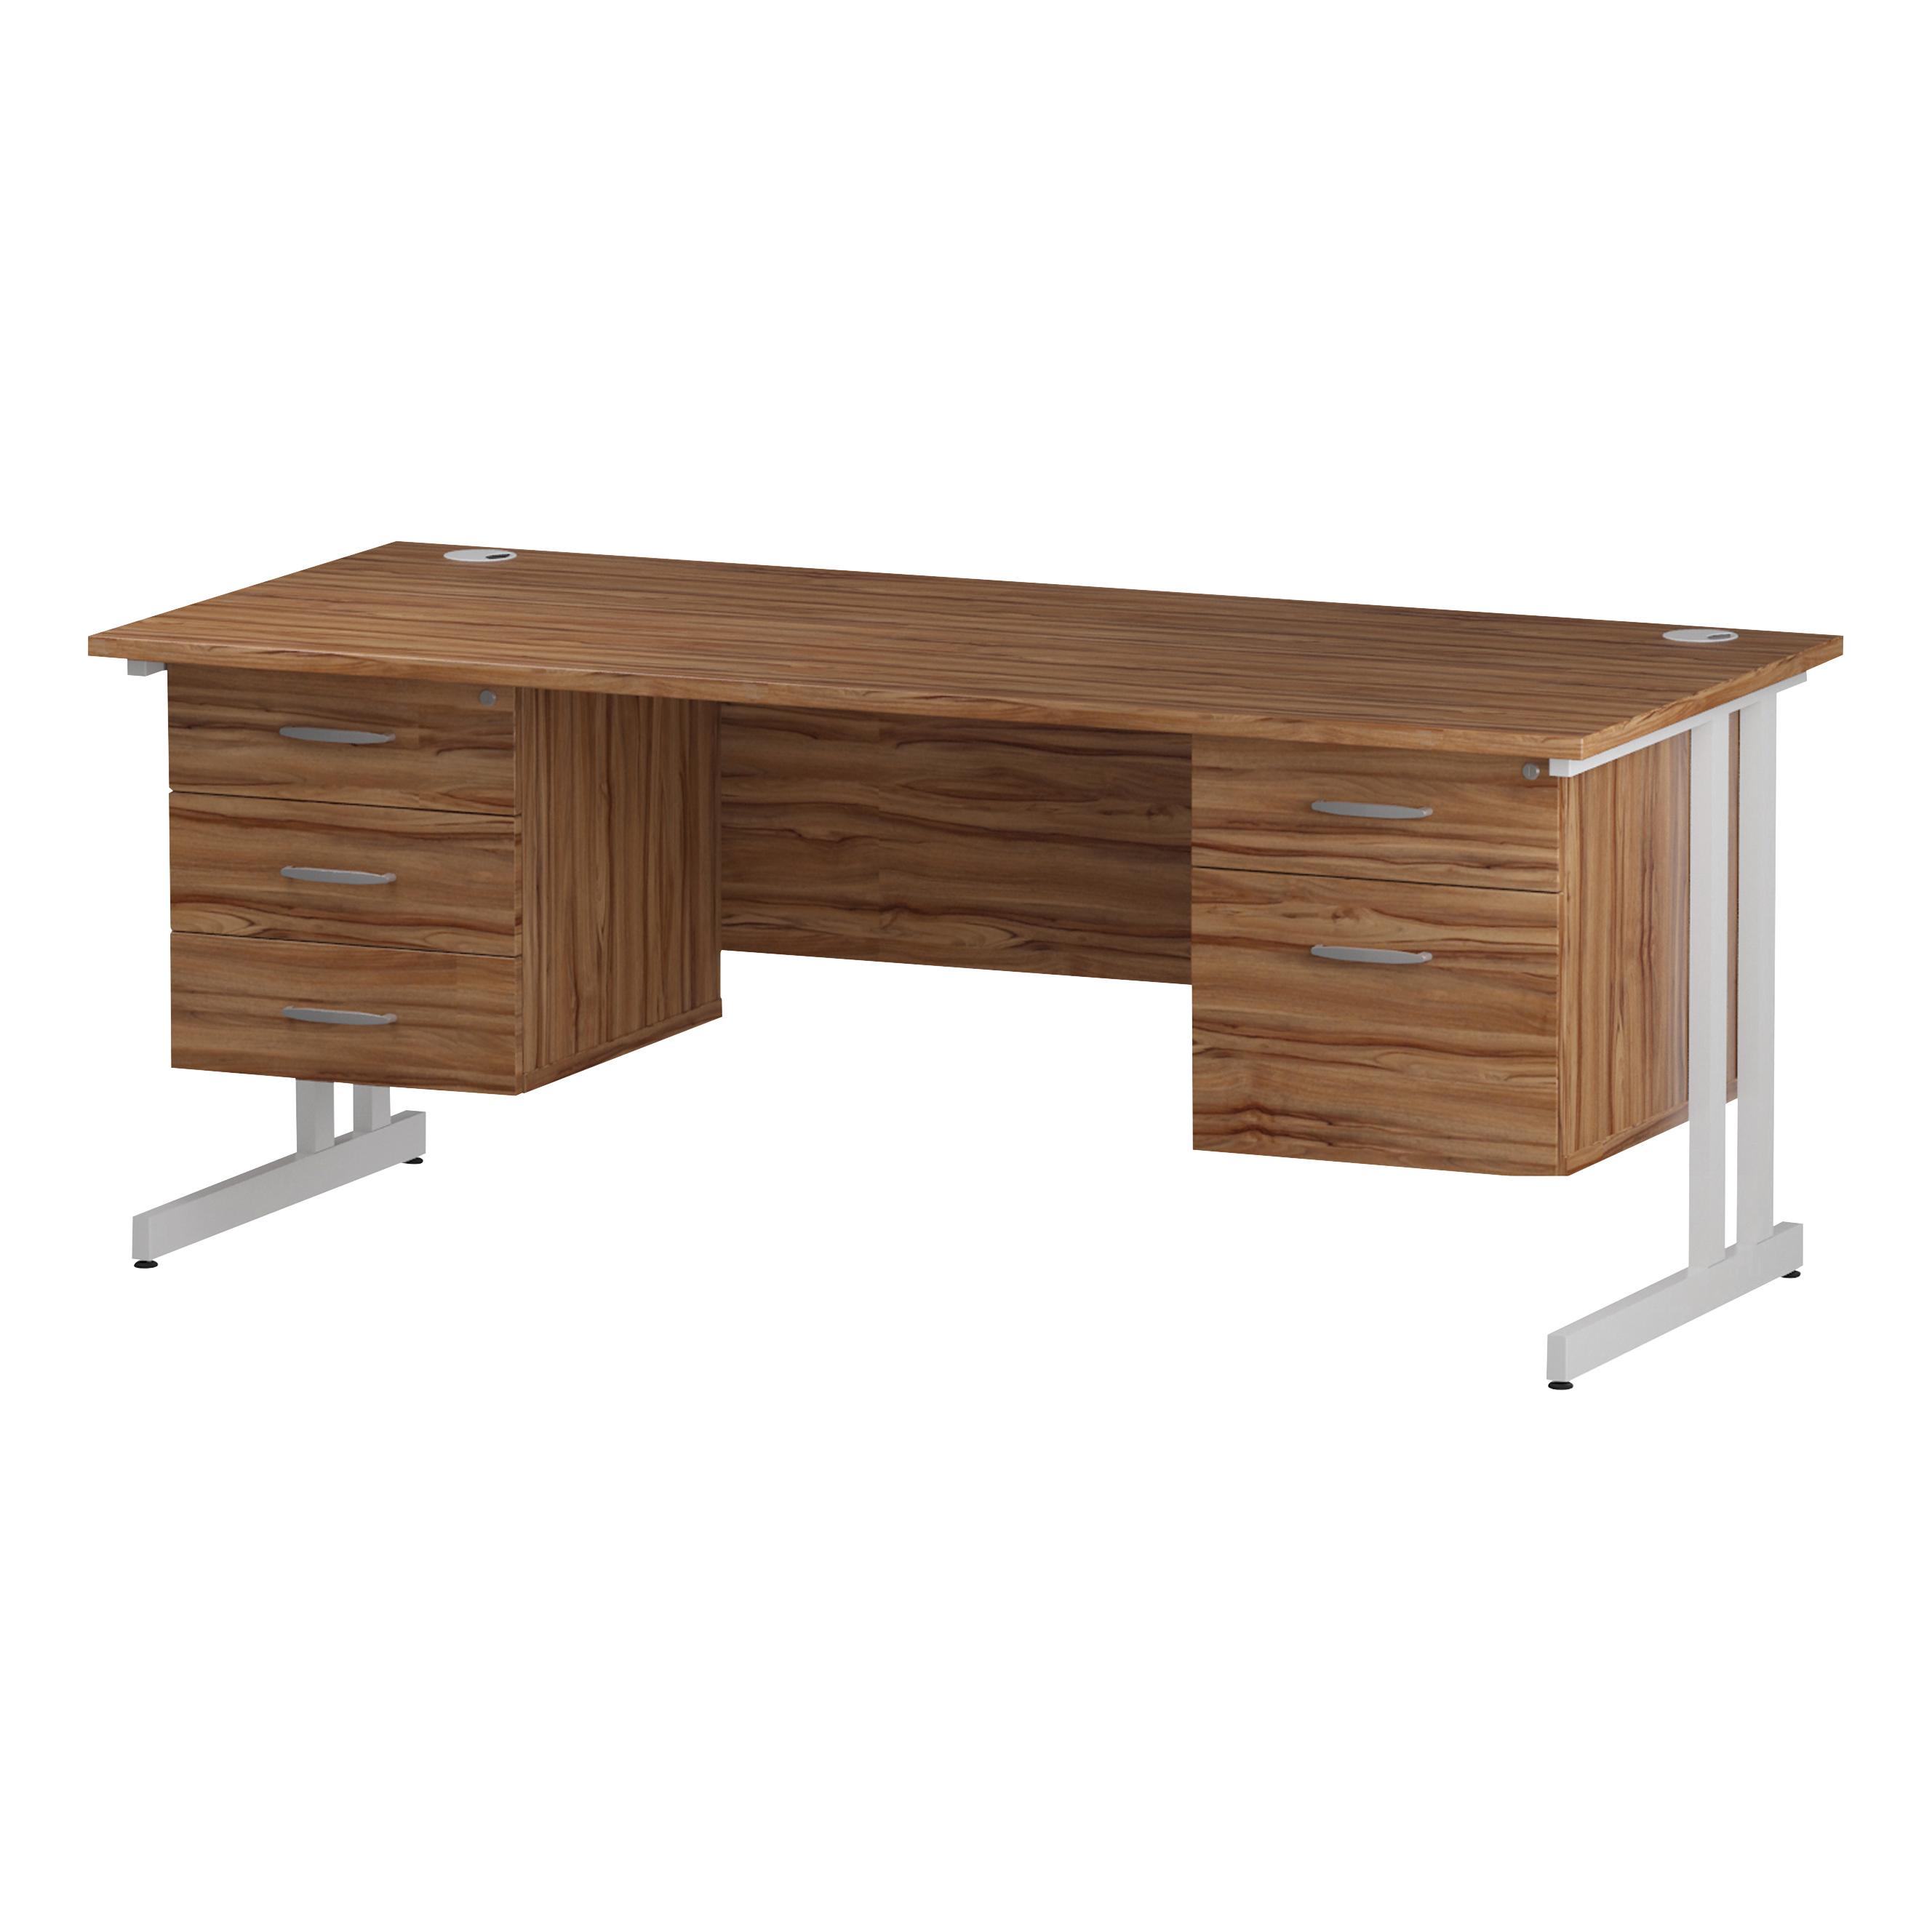 Trexus Rectangular Desk White Cantilever Leg 1800x800mm Double Fixed Ped 2&3 Drawers Walnut Ref I001958